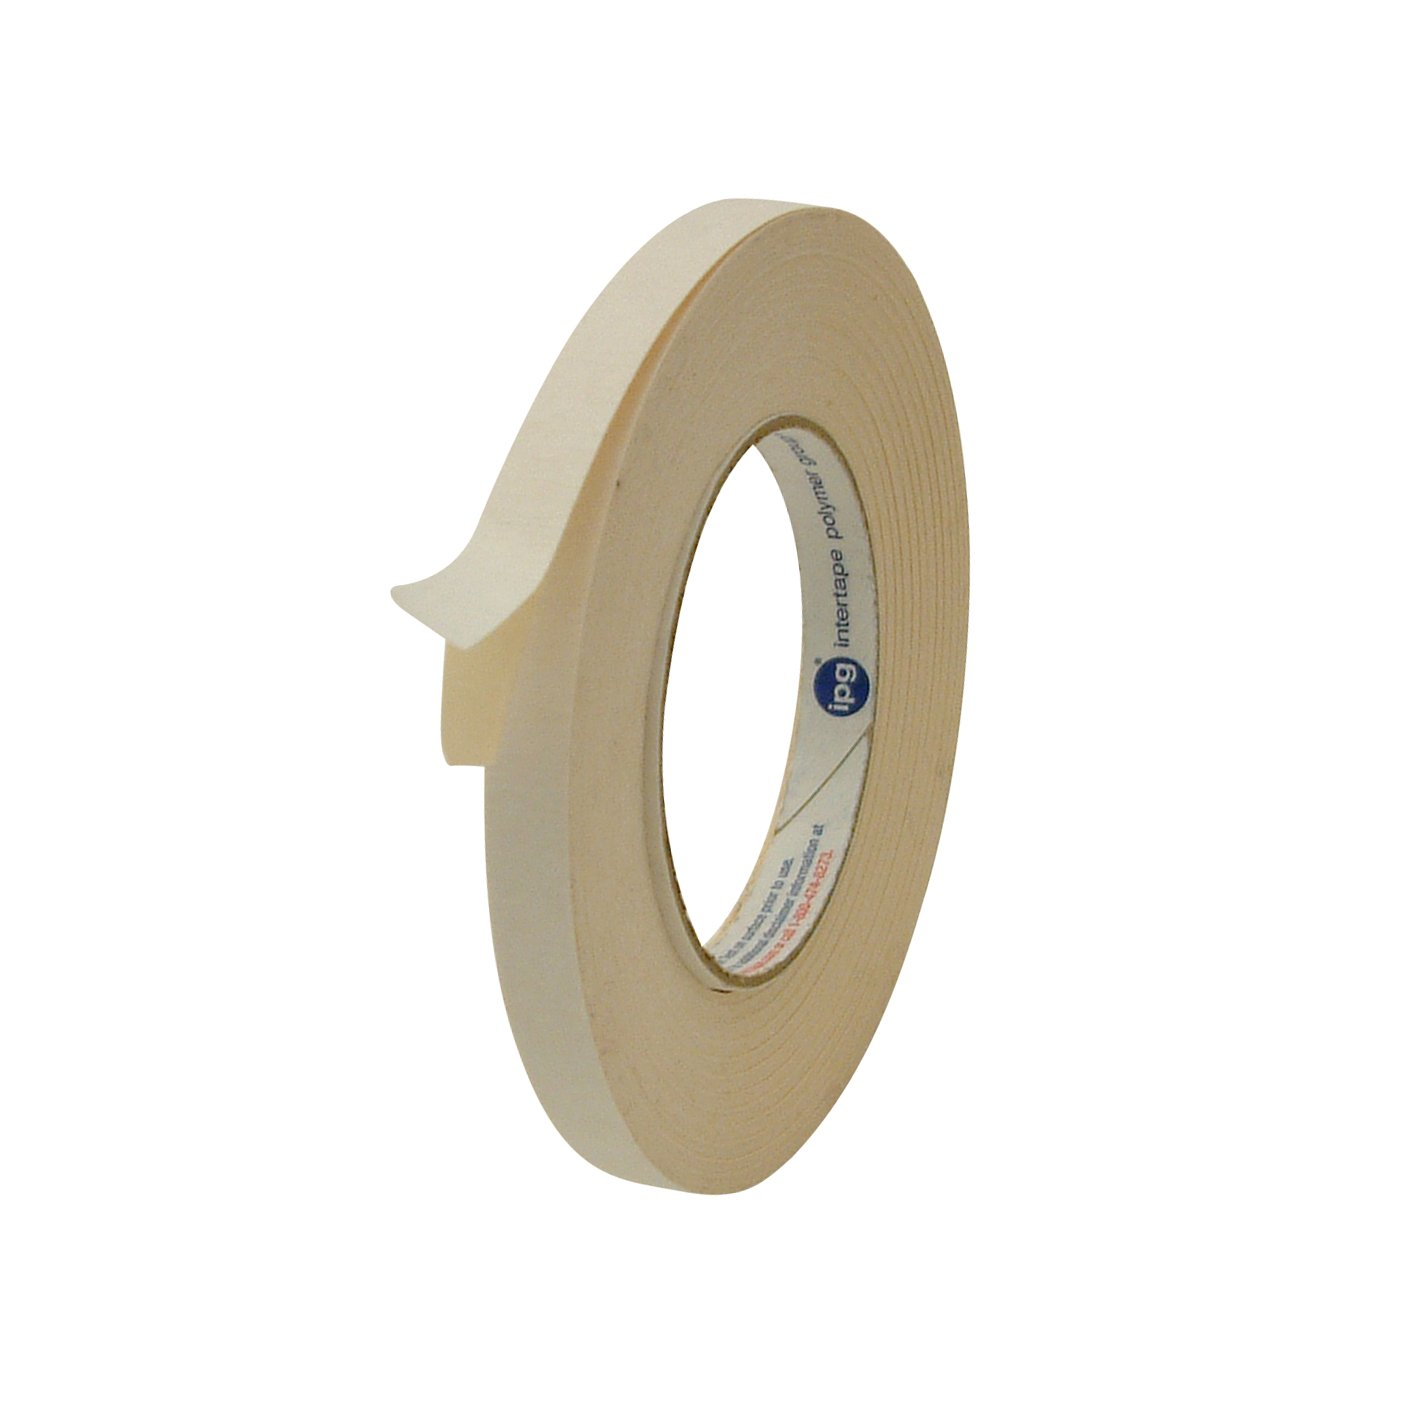 Intertape 591 Beig0536 Double Sided Flat Back Paper Wiring Loom Tape Nz 1 2 X 36 Yd Beige Industrial Scientific